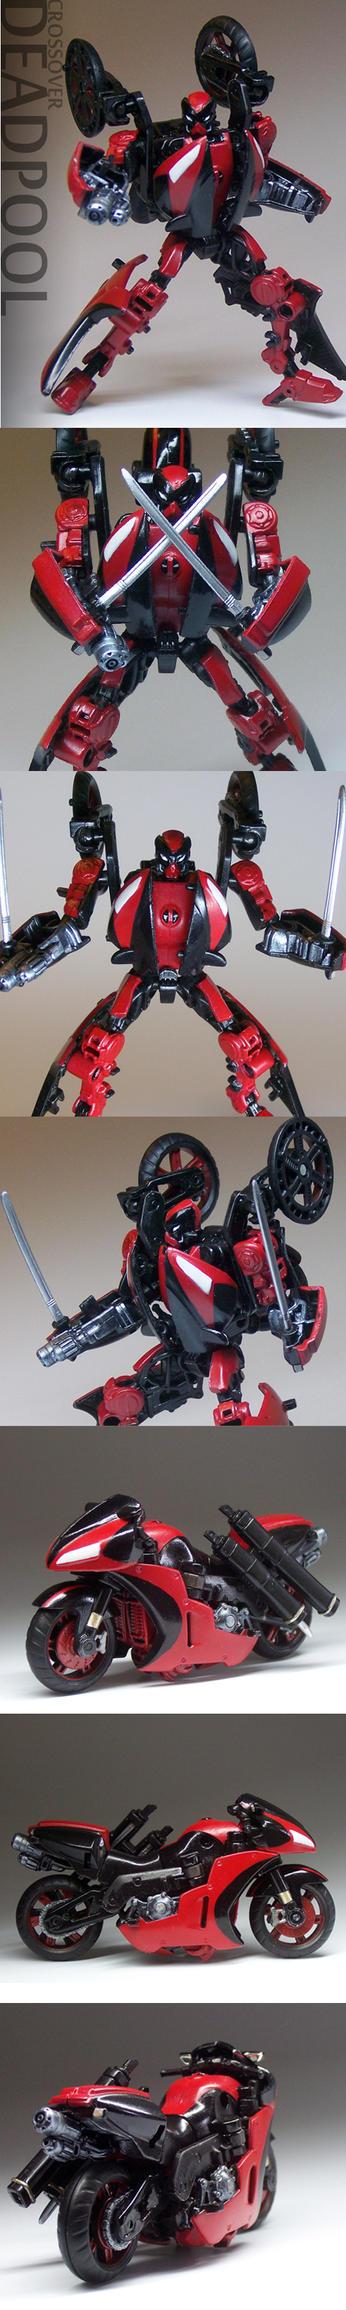 Custom Deadpool Transformer by NARPASWORD